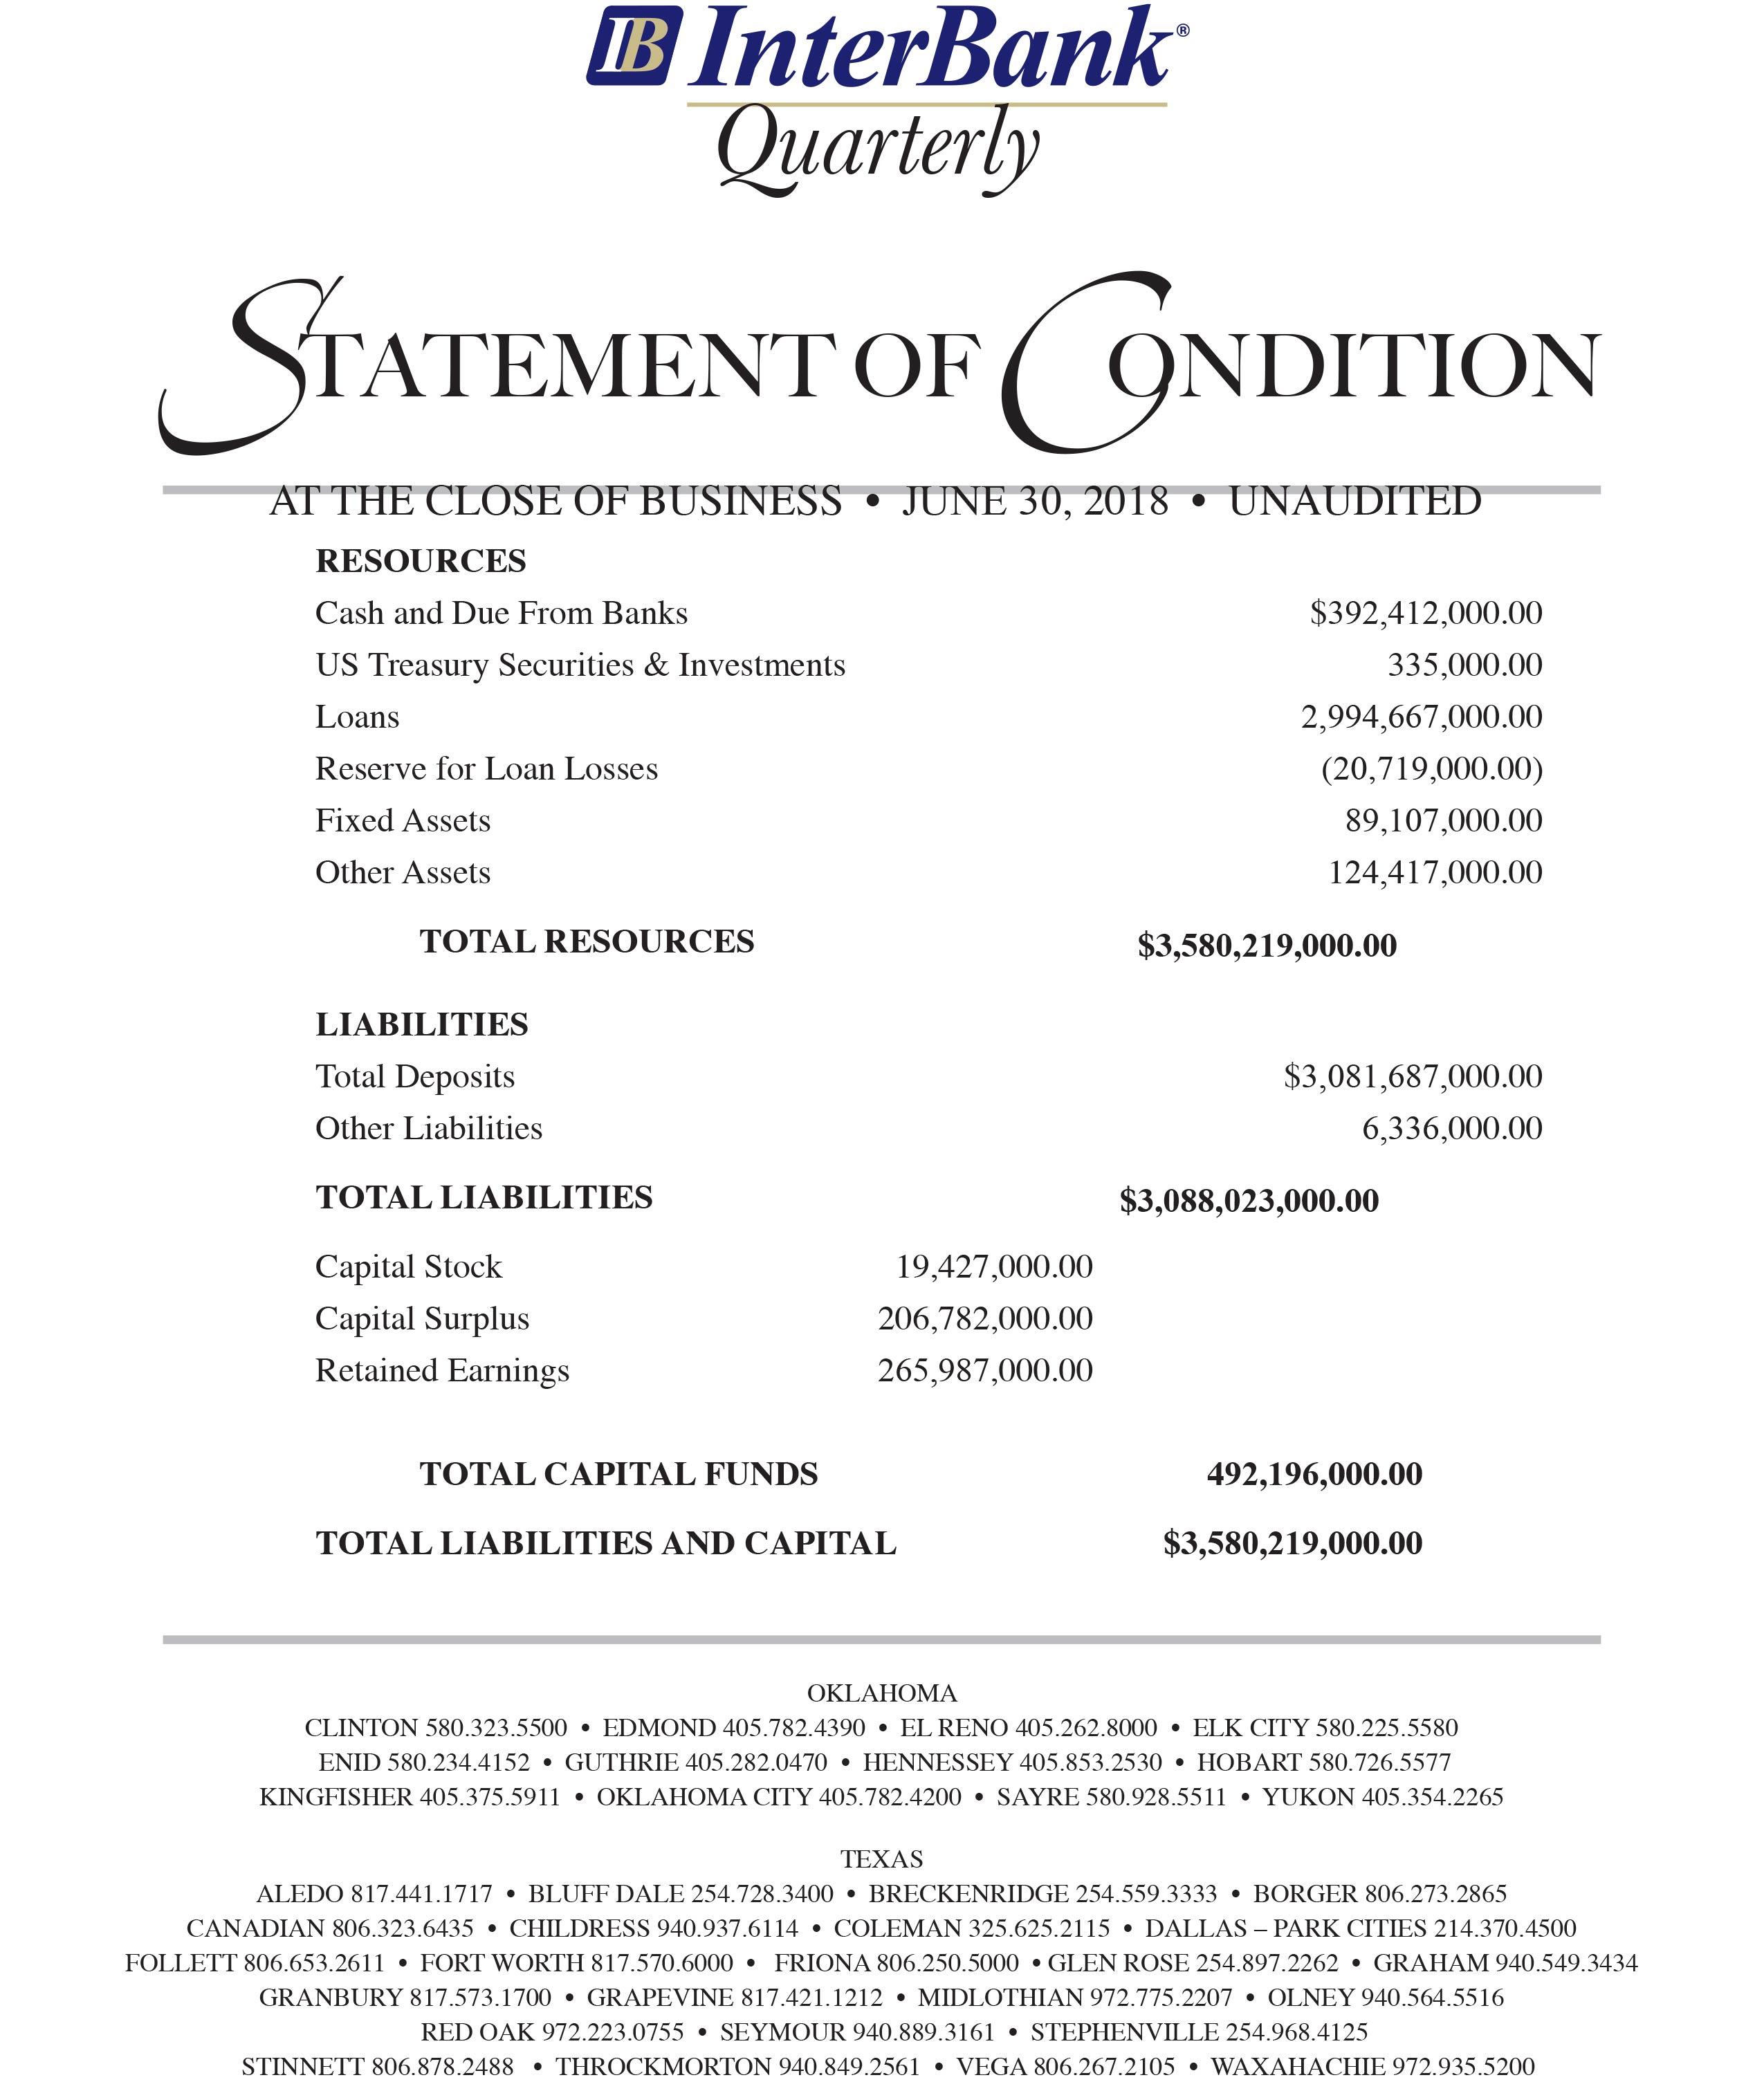 Interbank querterly statement of condition